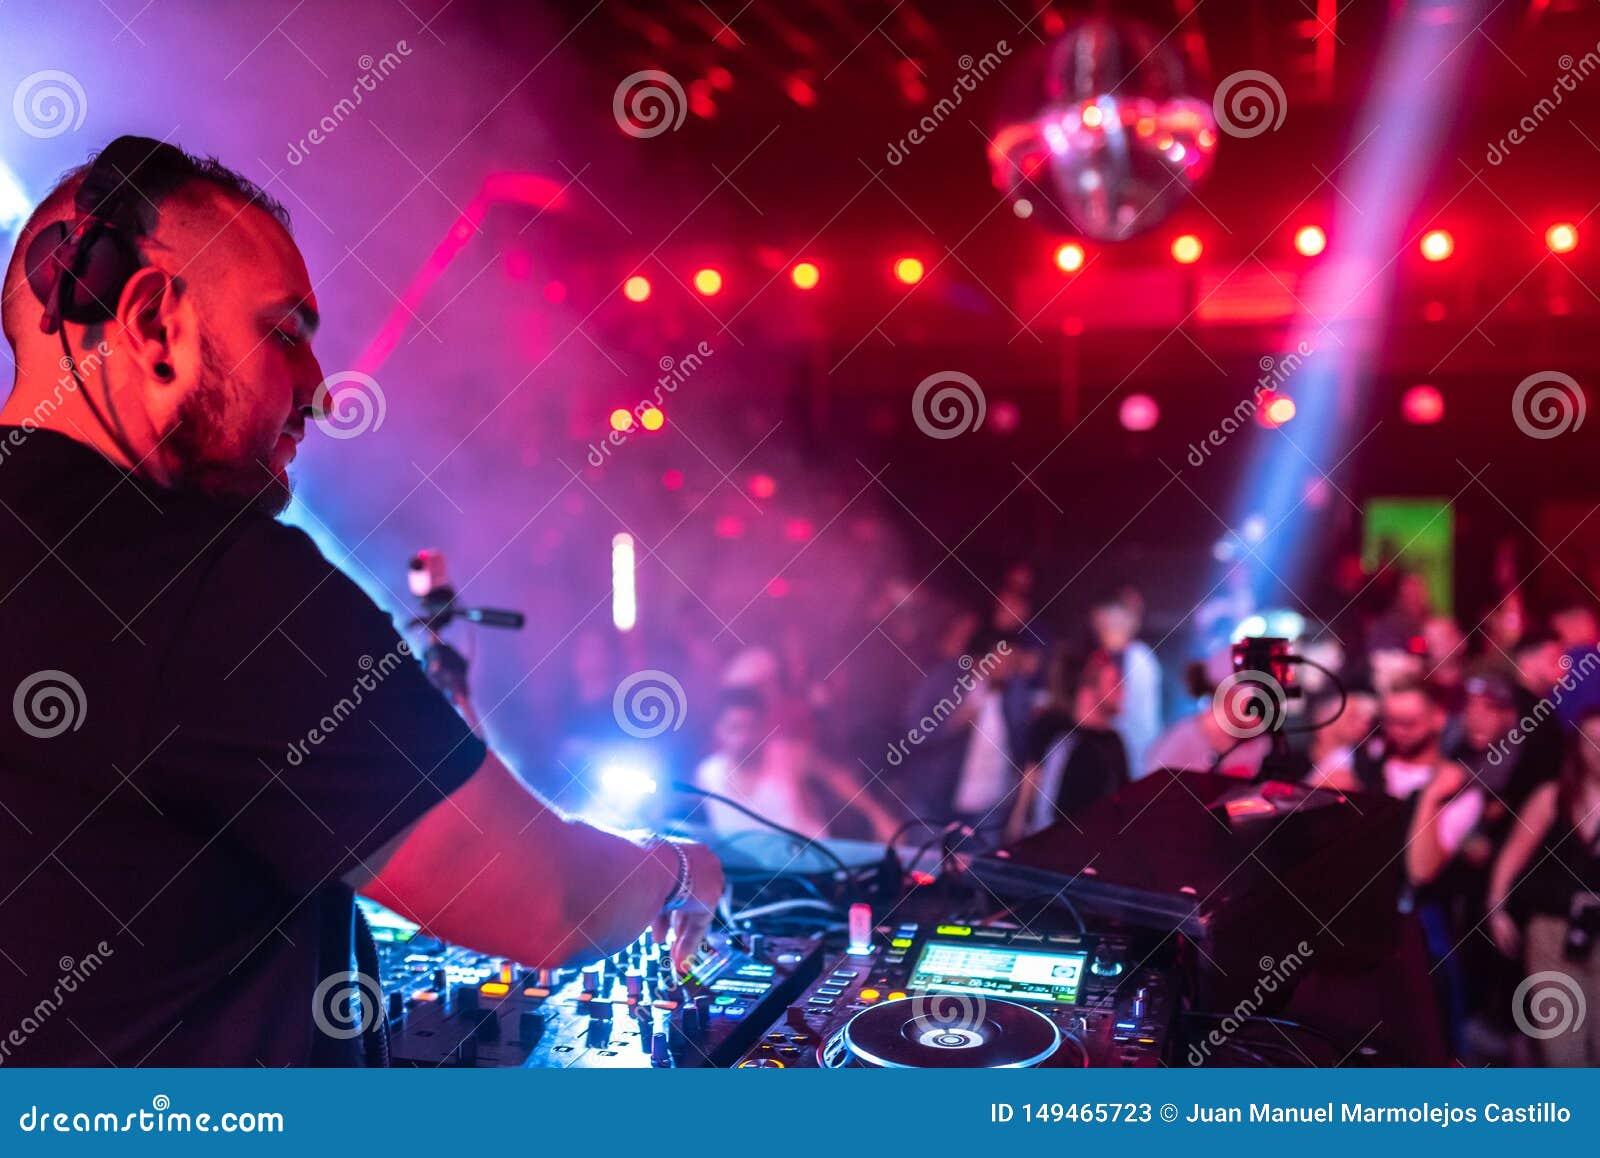 ночной клуб музыка техно